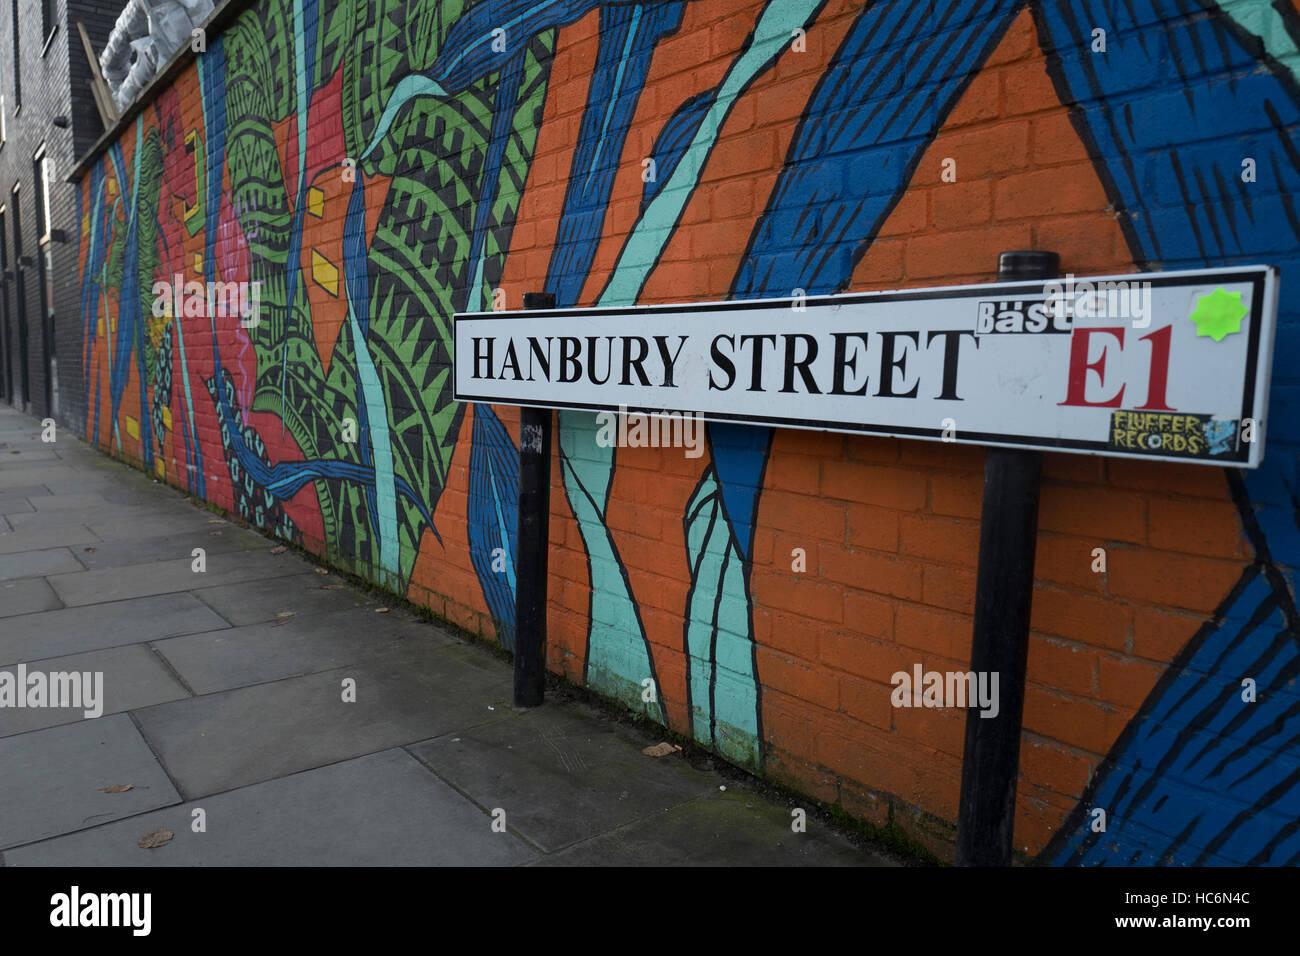 Hanbury Street London E1 street sign in Tower Hamlets - Stock Image